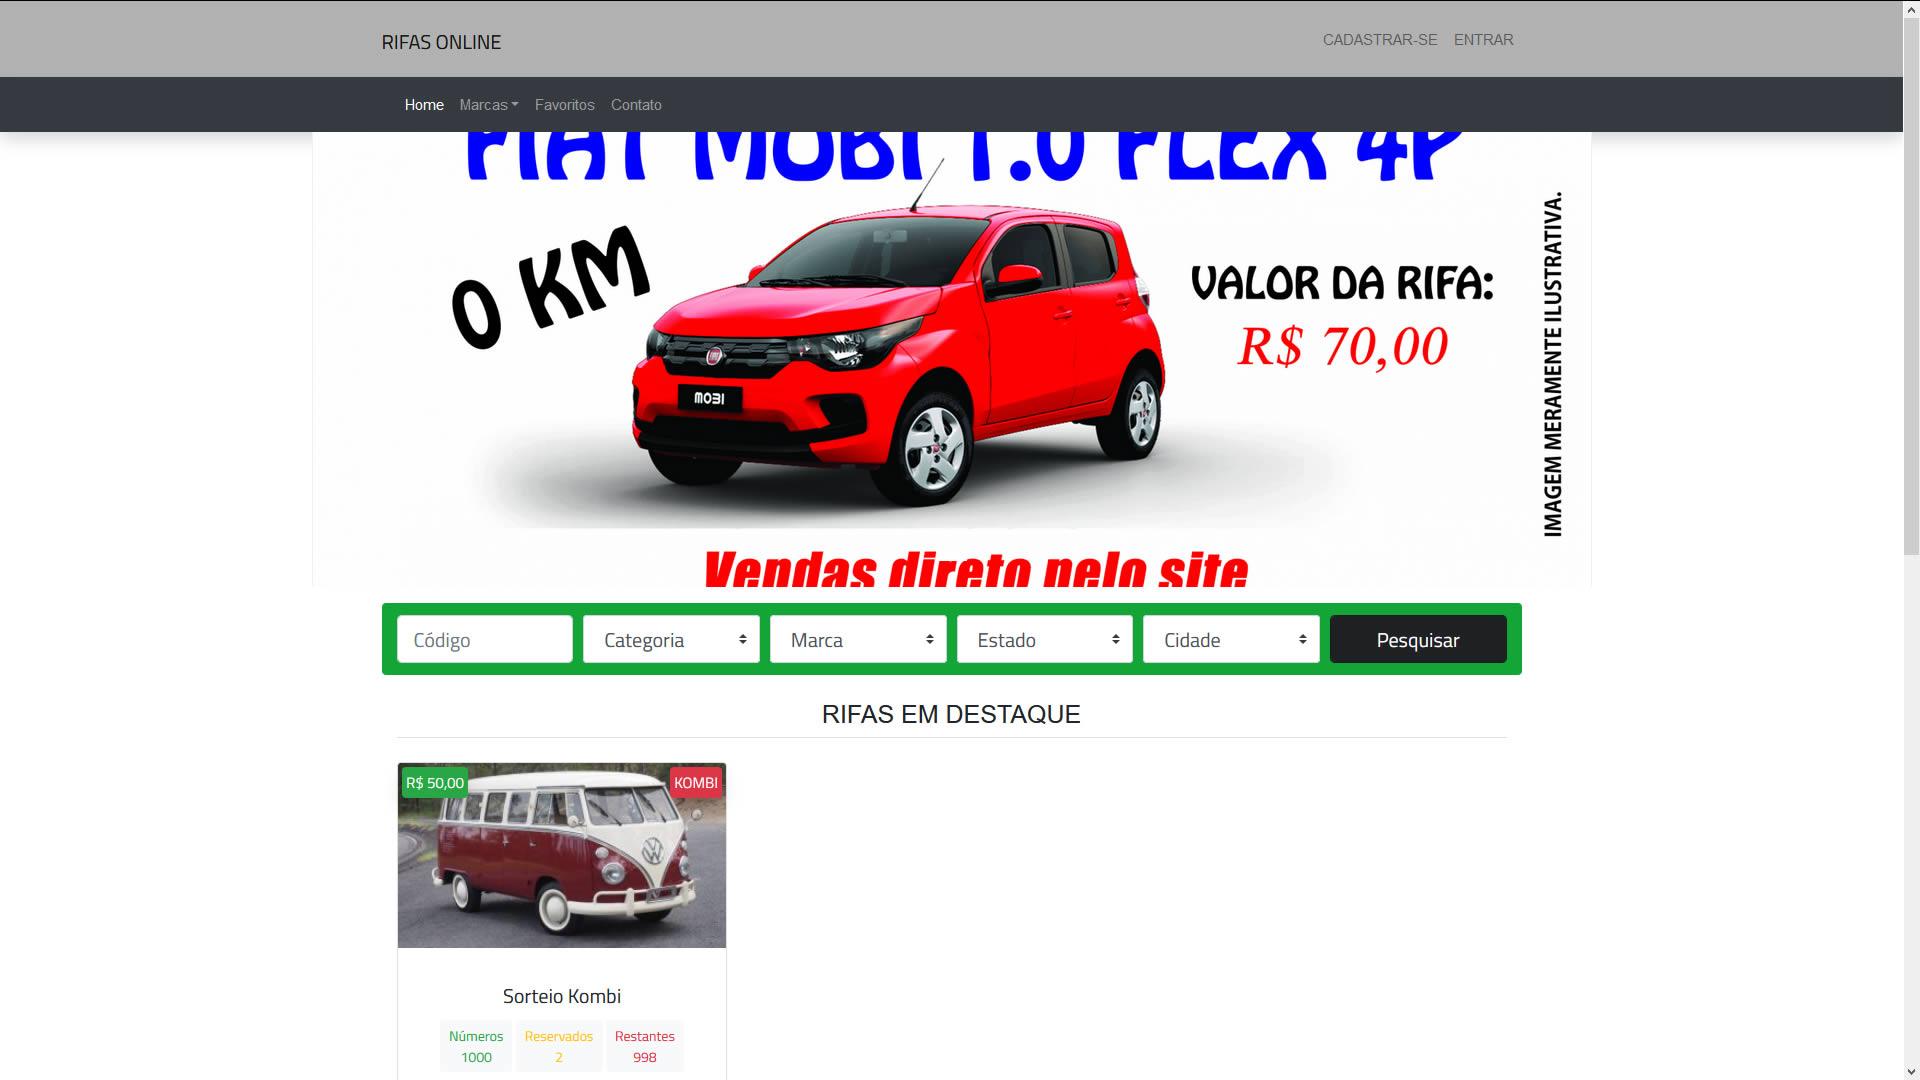 Sistema de Rifas Online 2 off